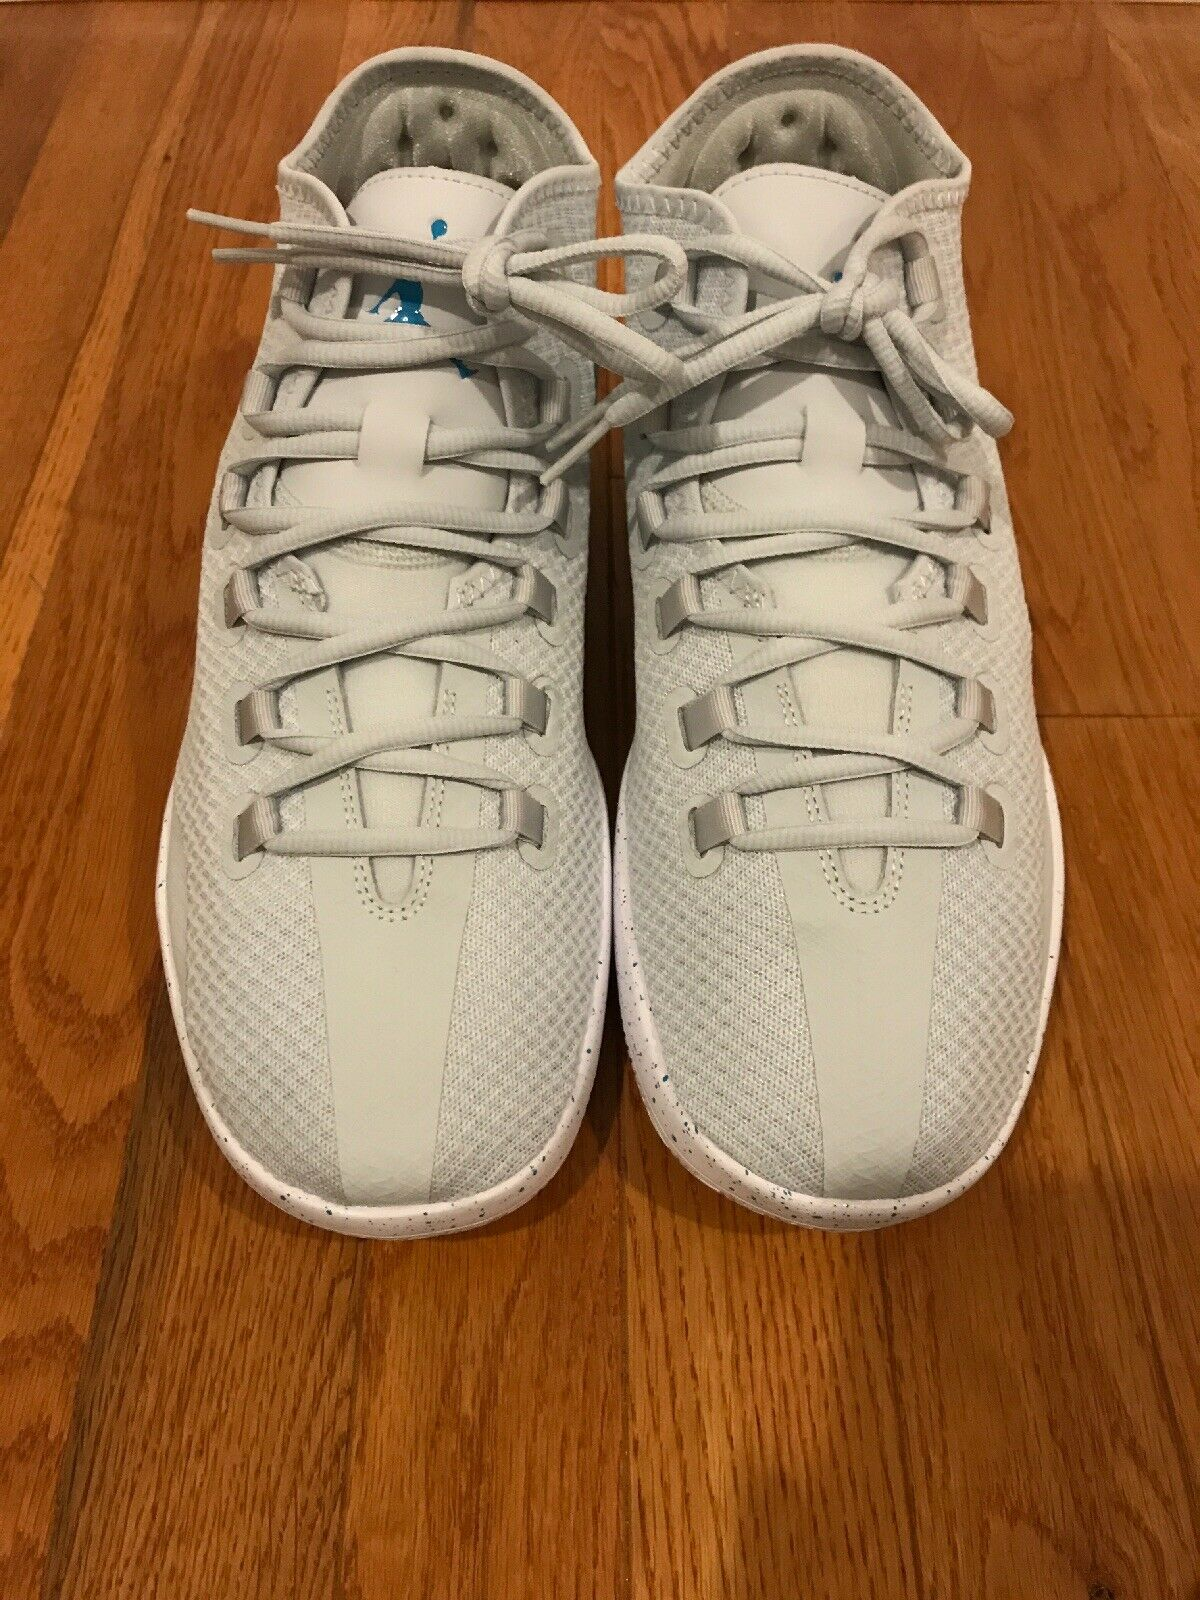 Nike Jordan Reveal Trainers 834064-022 Platinum blueee White Infrared Mens Size 10